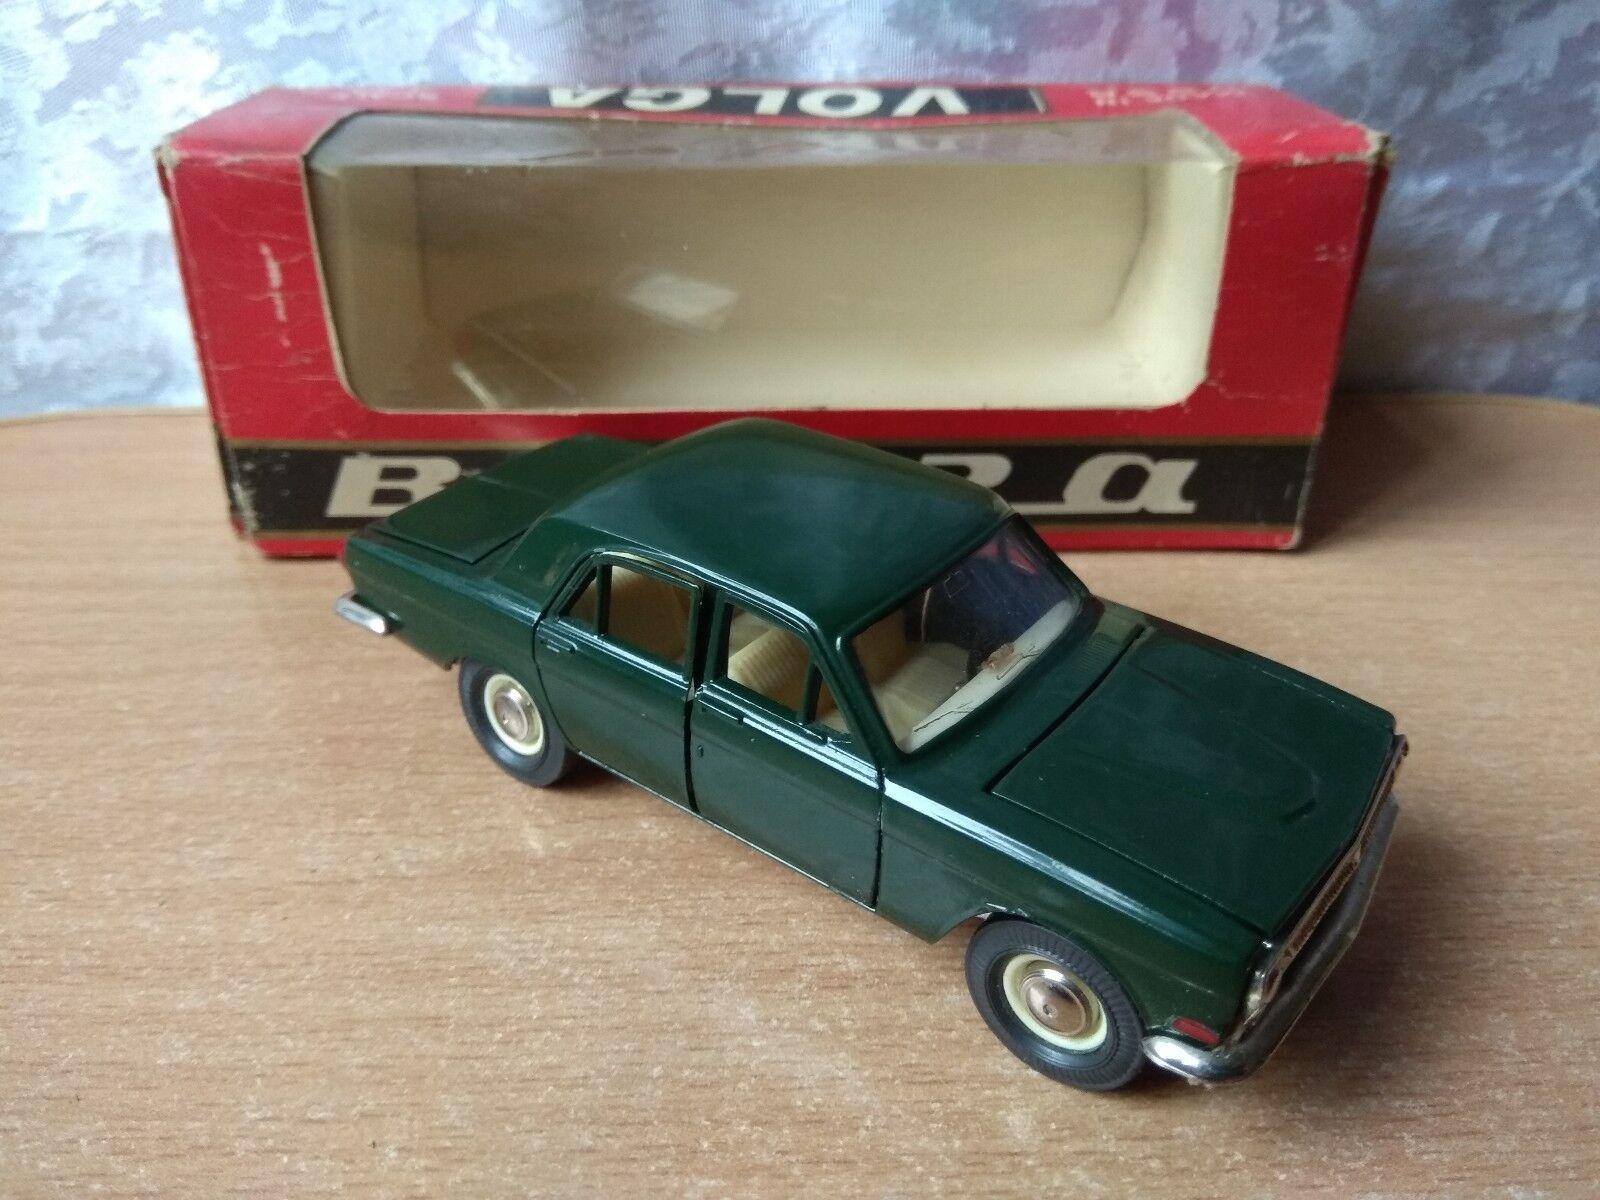 Vintage metal toy soviet car СССР 1 43 model USSR USSR USSR Gaz 24 Wolga Volga A 14 c2a808